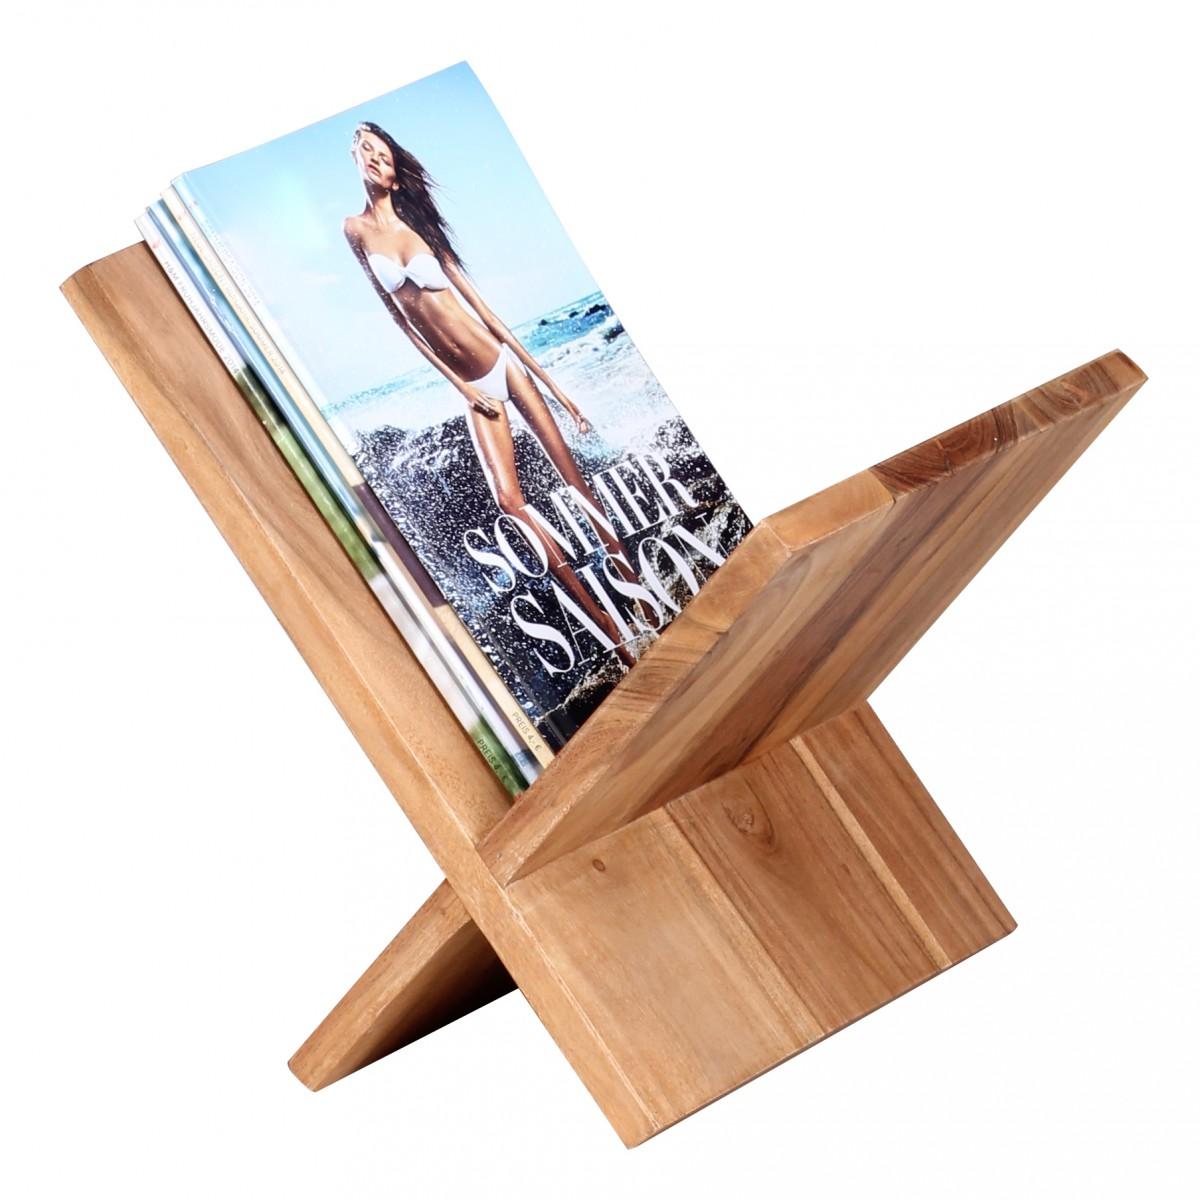 Wohnling zeitungsst nder massivholz akazie x form 31 cm - Porte revues en bois ...